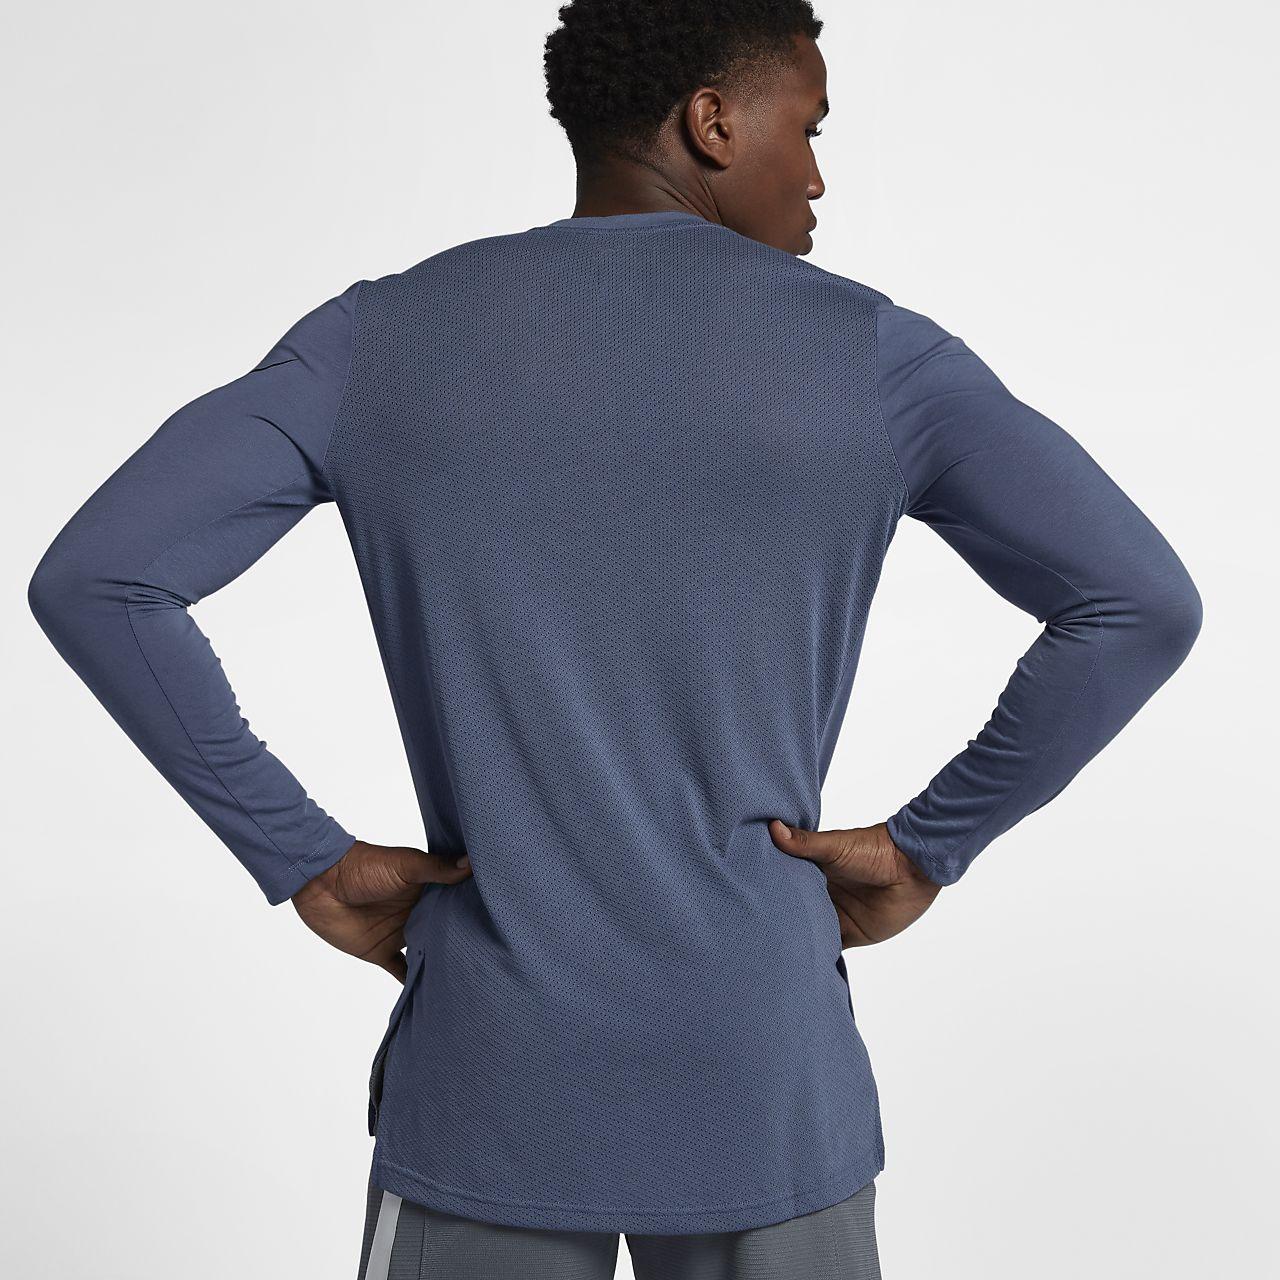 2c765ec628231 Nike Breathe Elite Men s Long-Sleeve Basketball Top. Nike.com CA